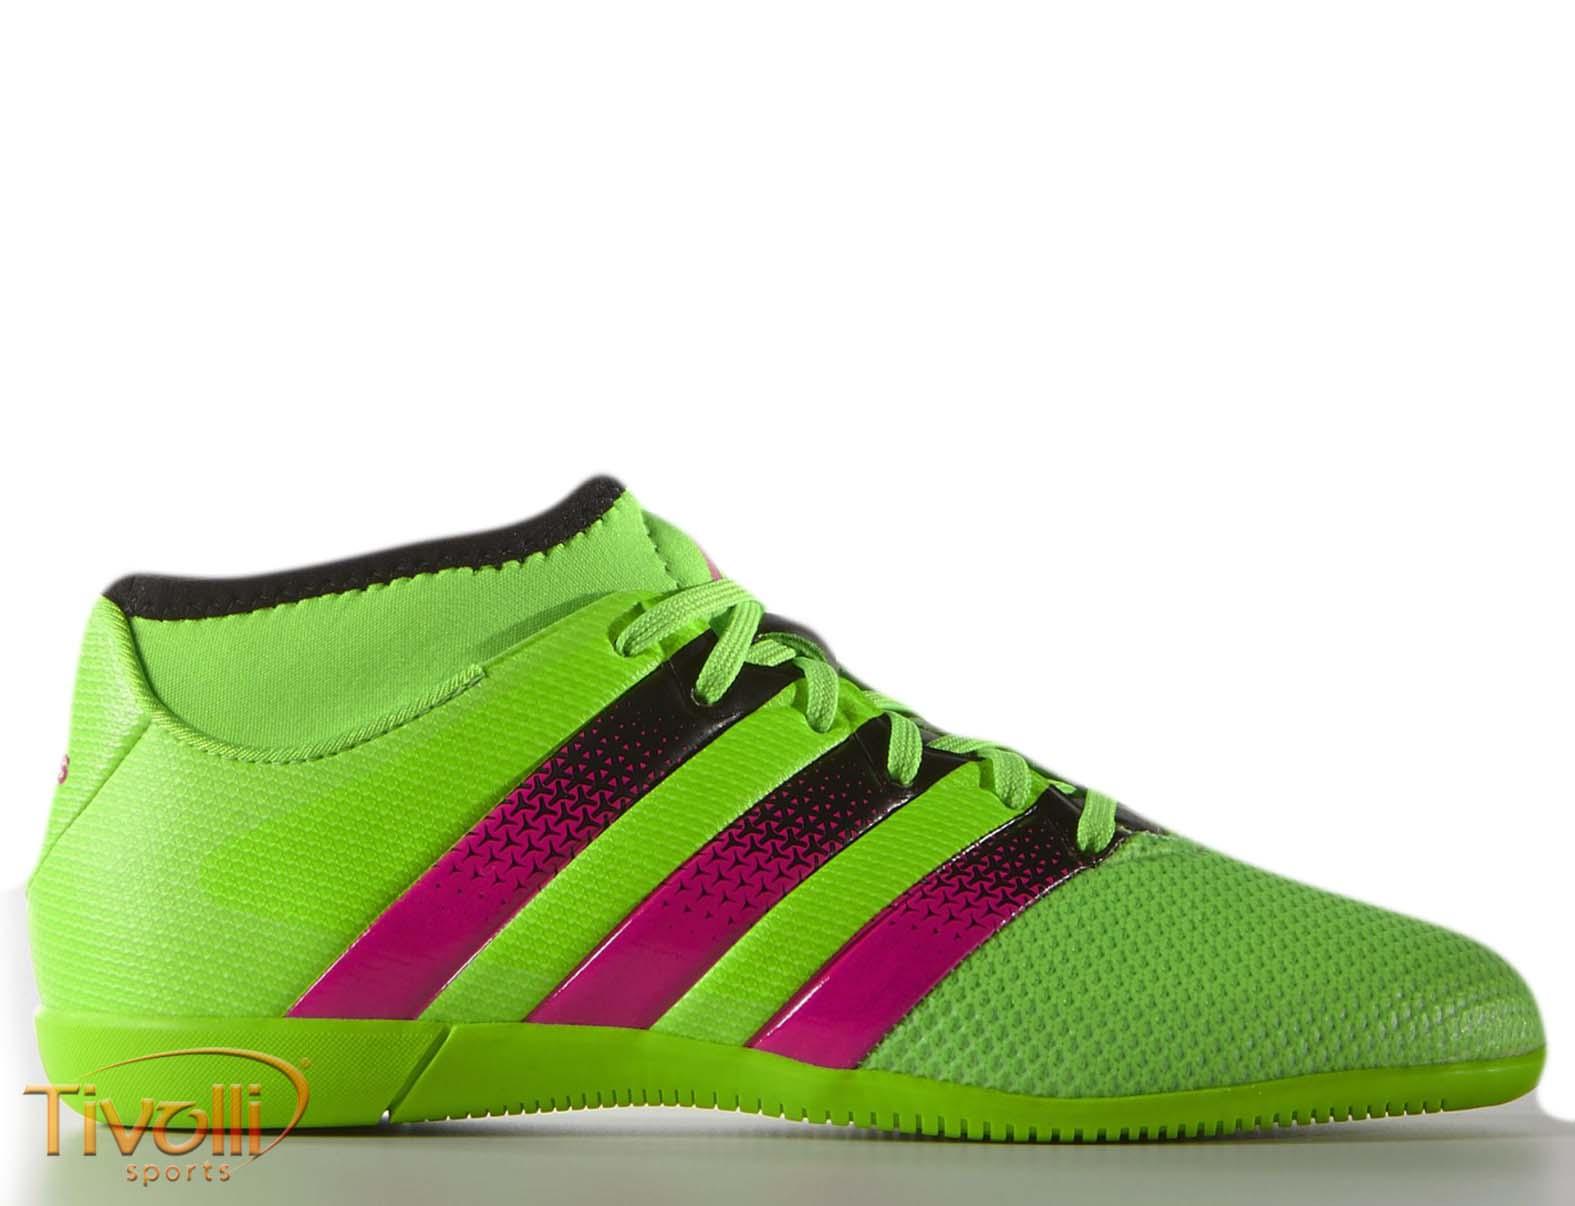 87e0586862 Chuteira Adidas Ace 16.3 Primesh Infantil Futsal   Verde